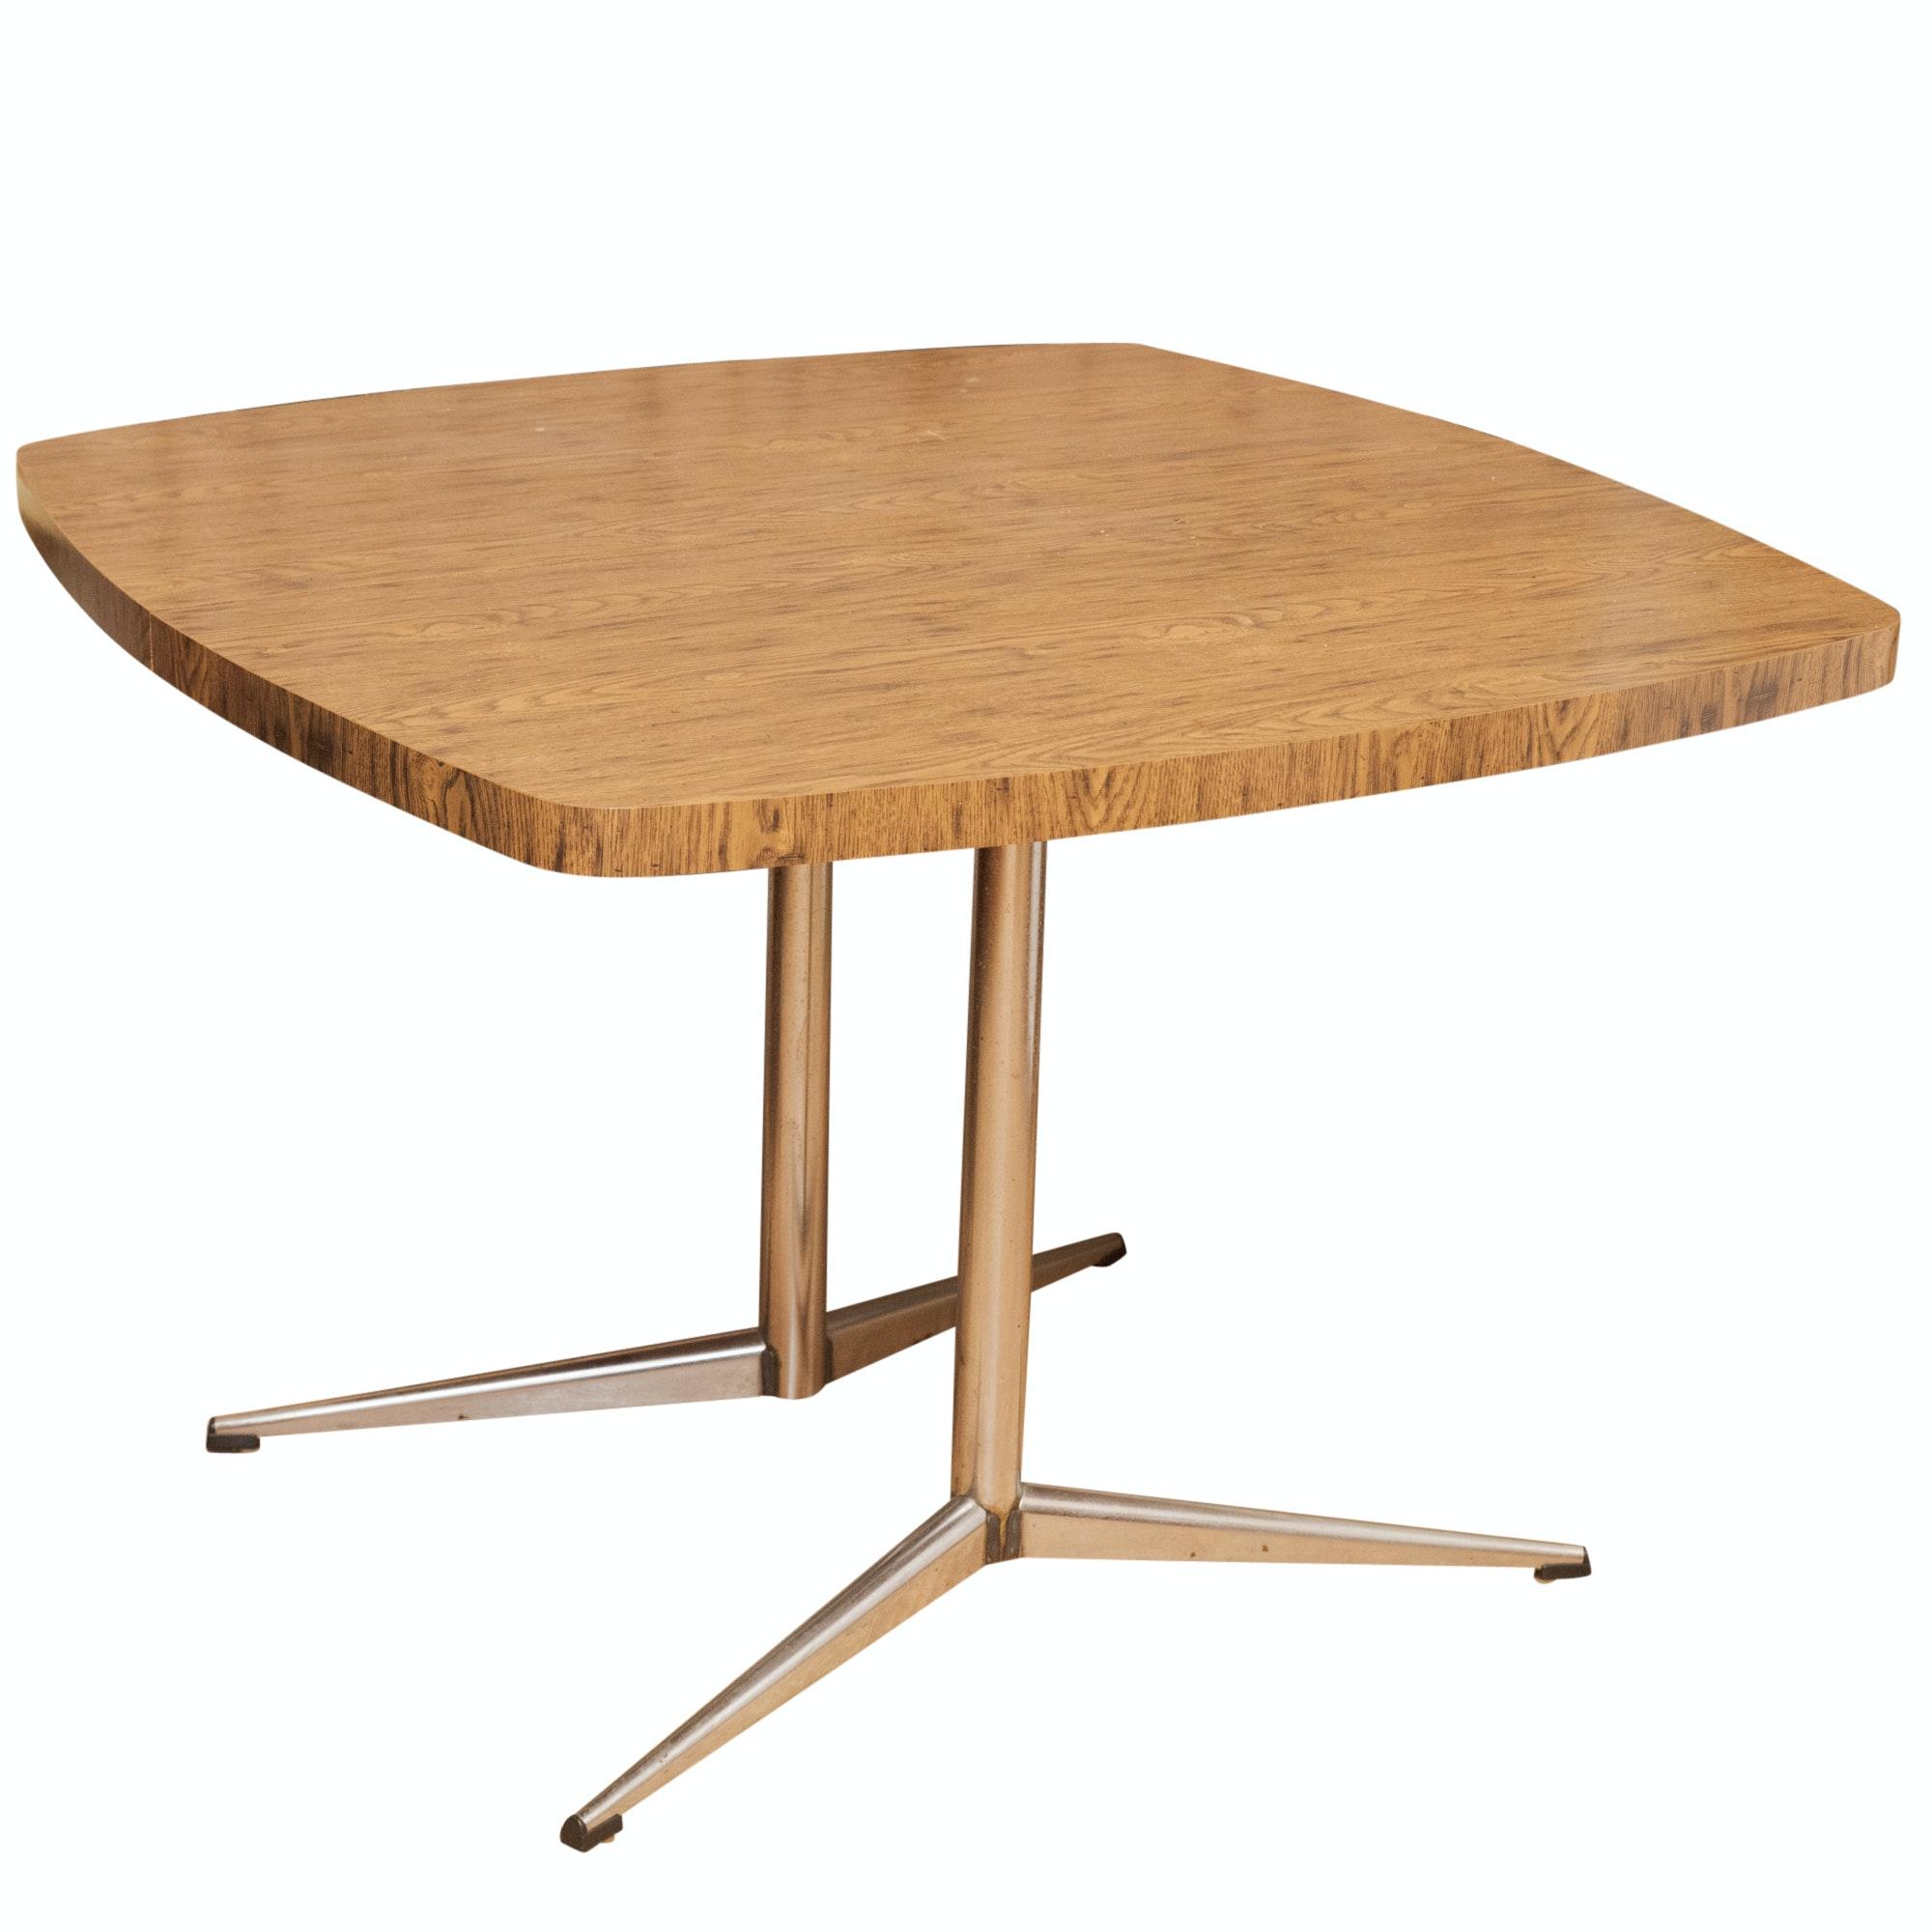 Mid Century Modern Melamine Resin and Metal Dinette Table, Mid-20th Century